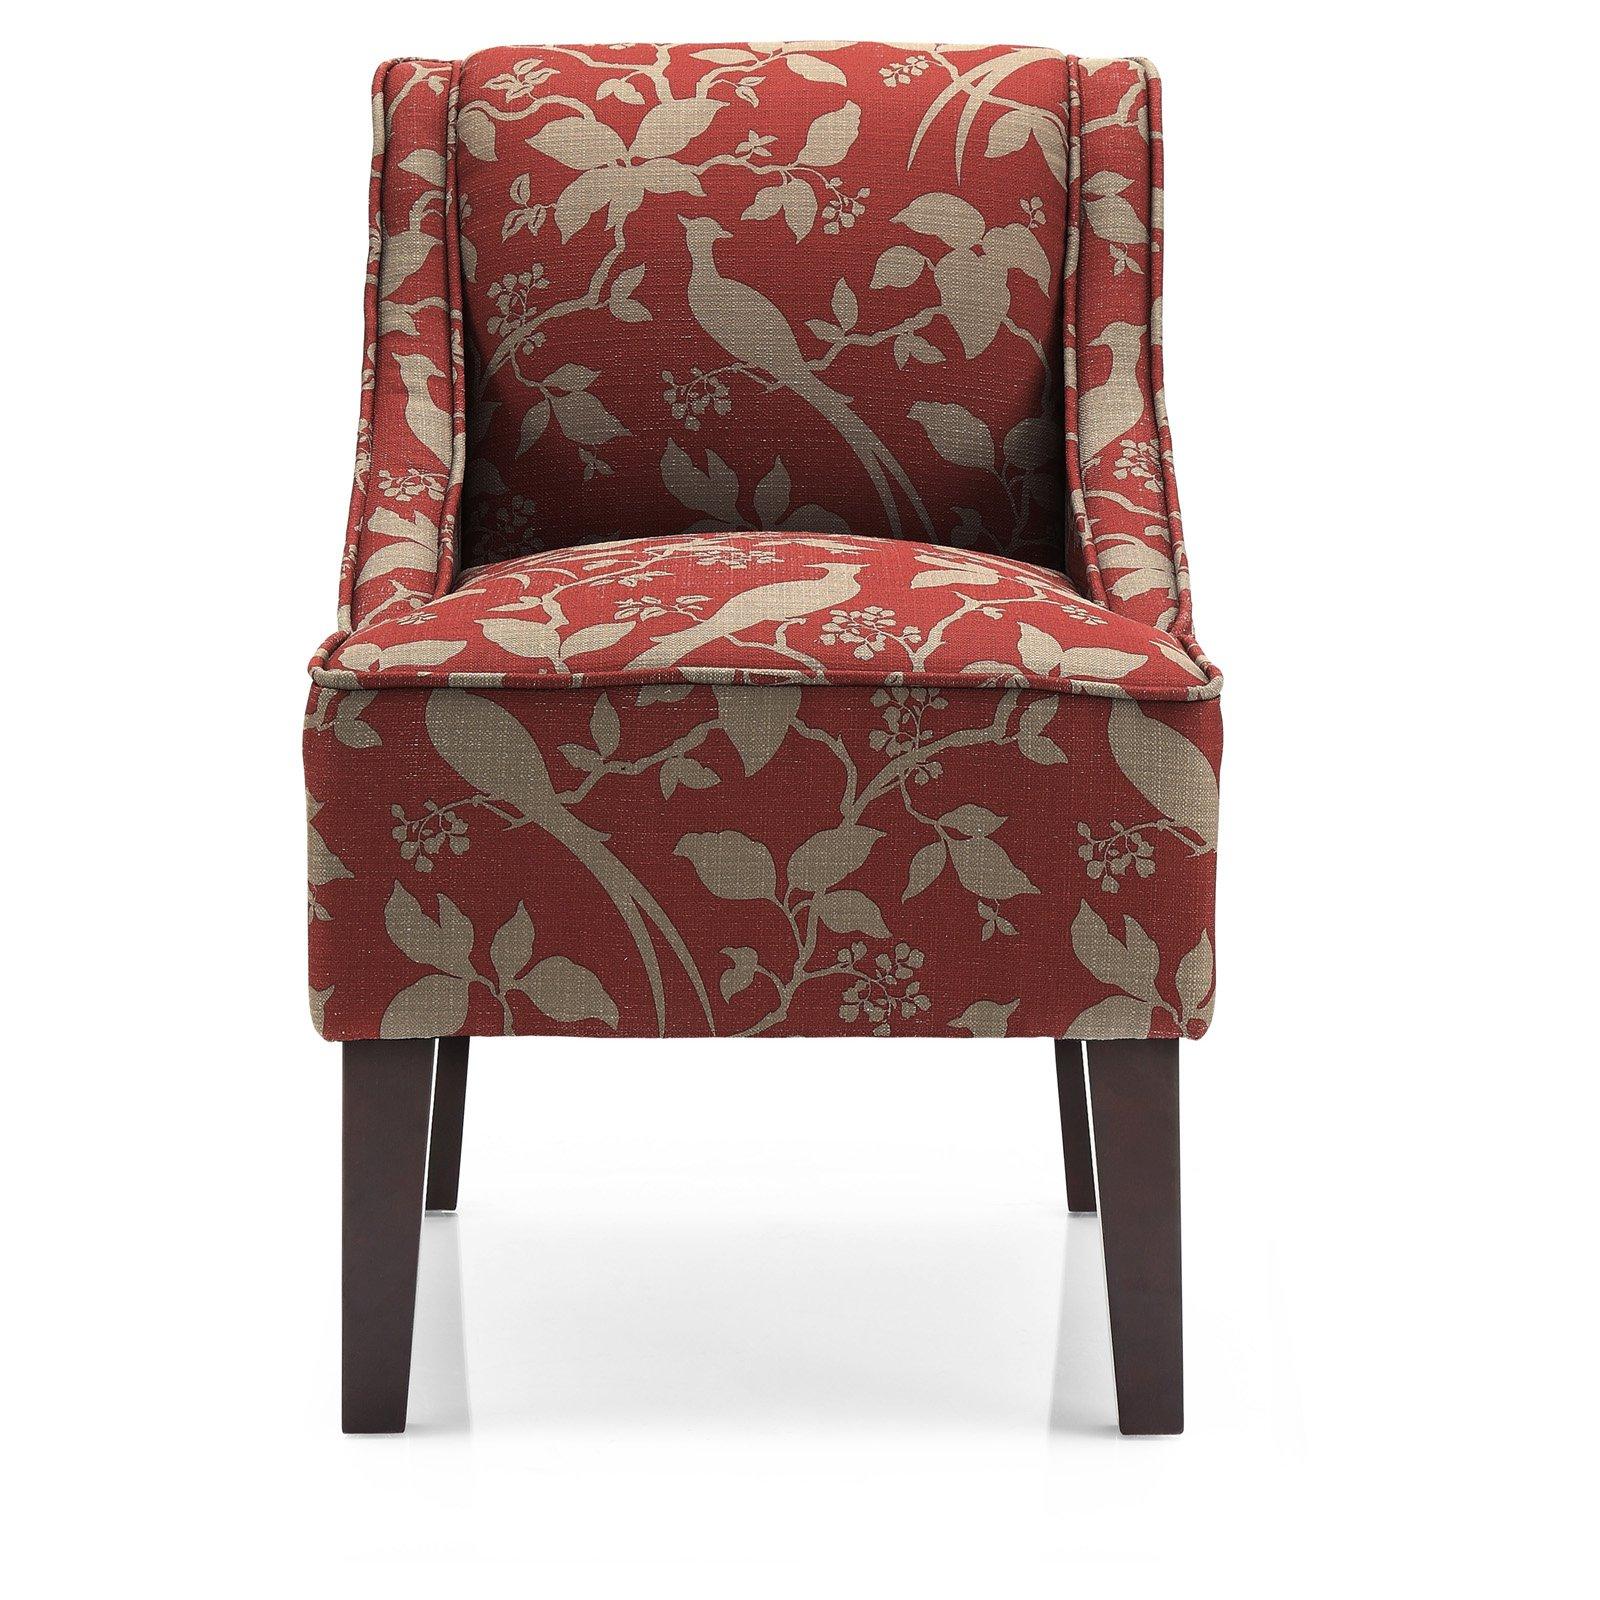 Marlow Accent Bardot Chair